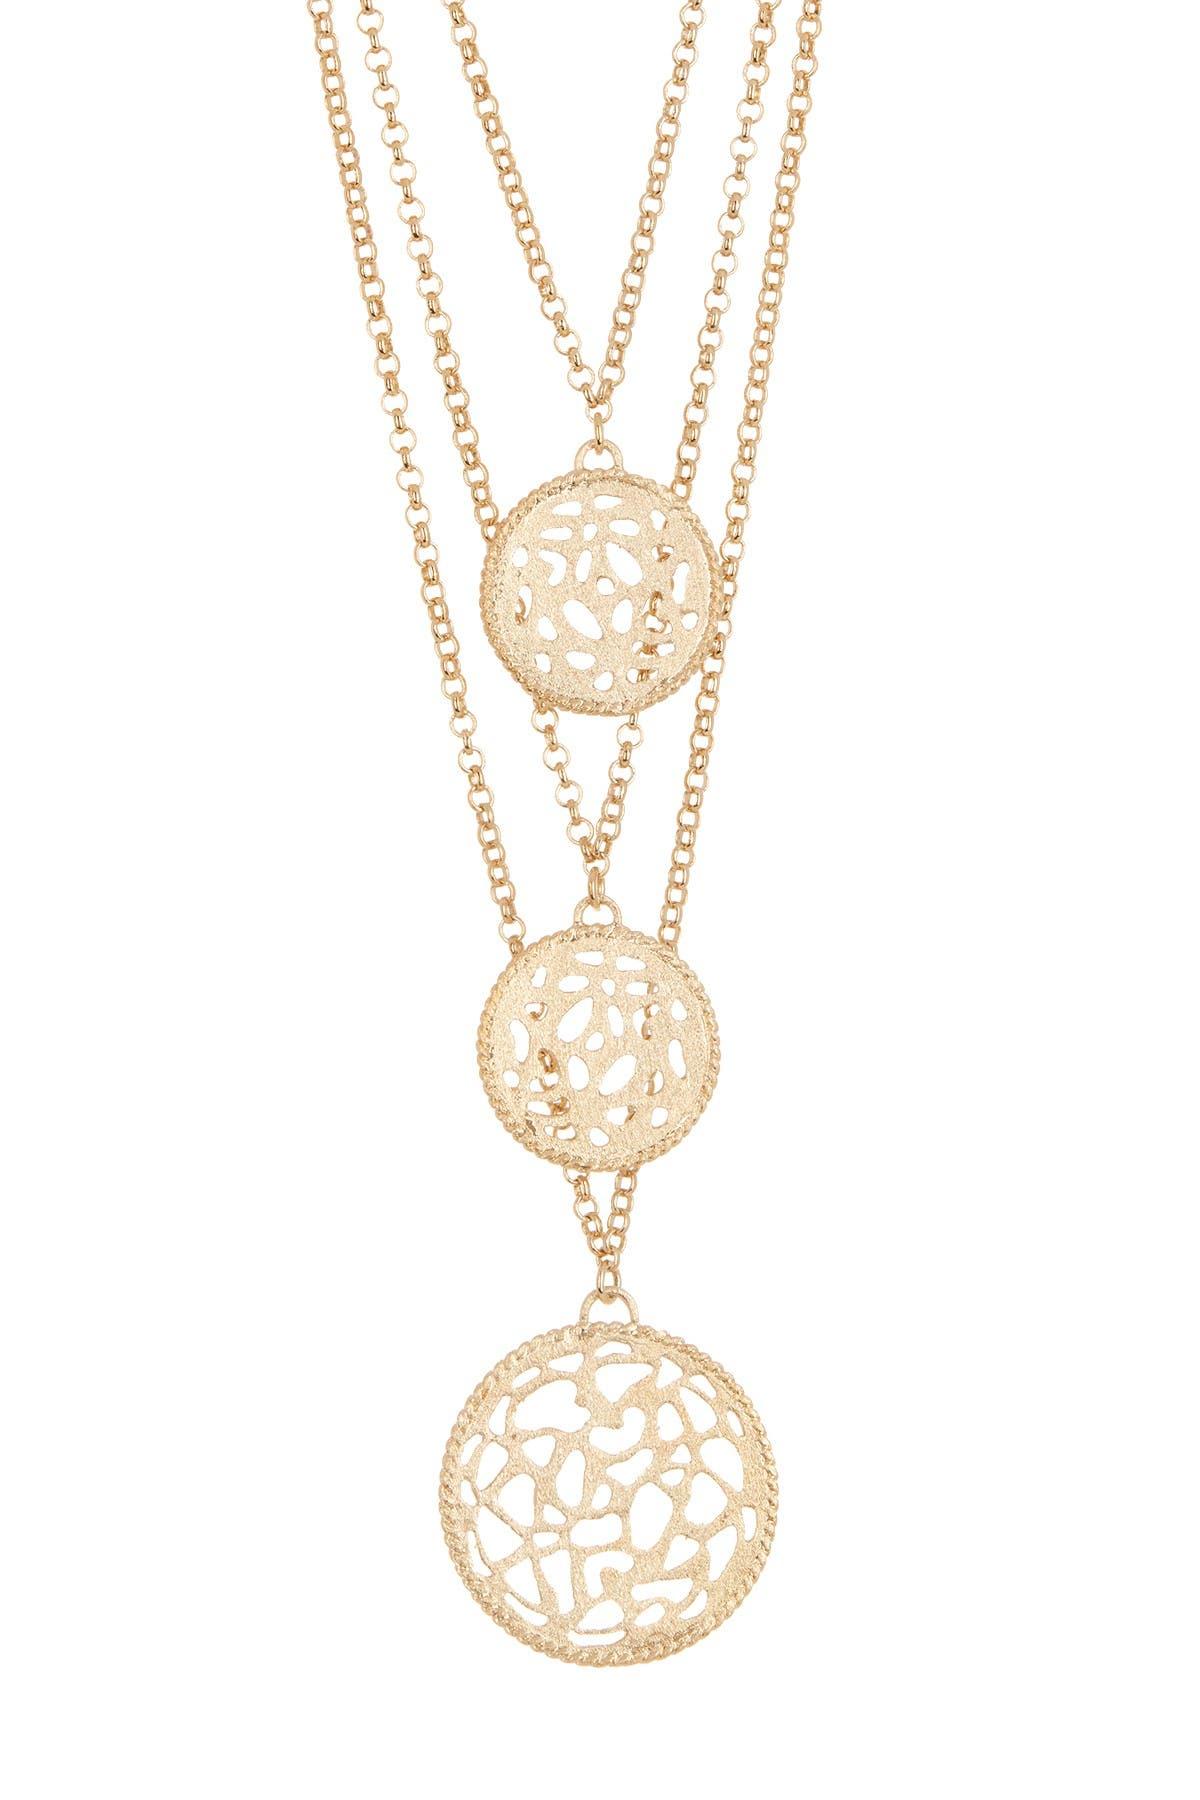 Image of Rivka Friedman 18K Gold-Plated Brass Layered  Medallion Necklace